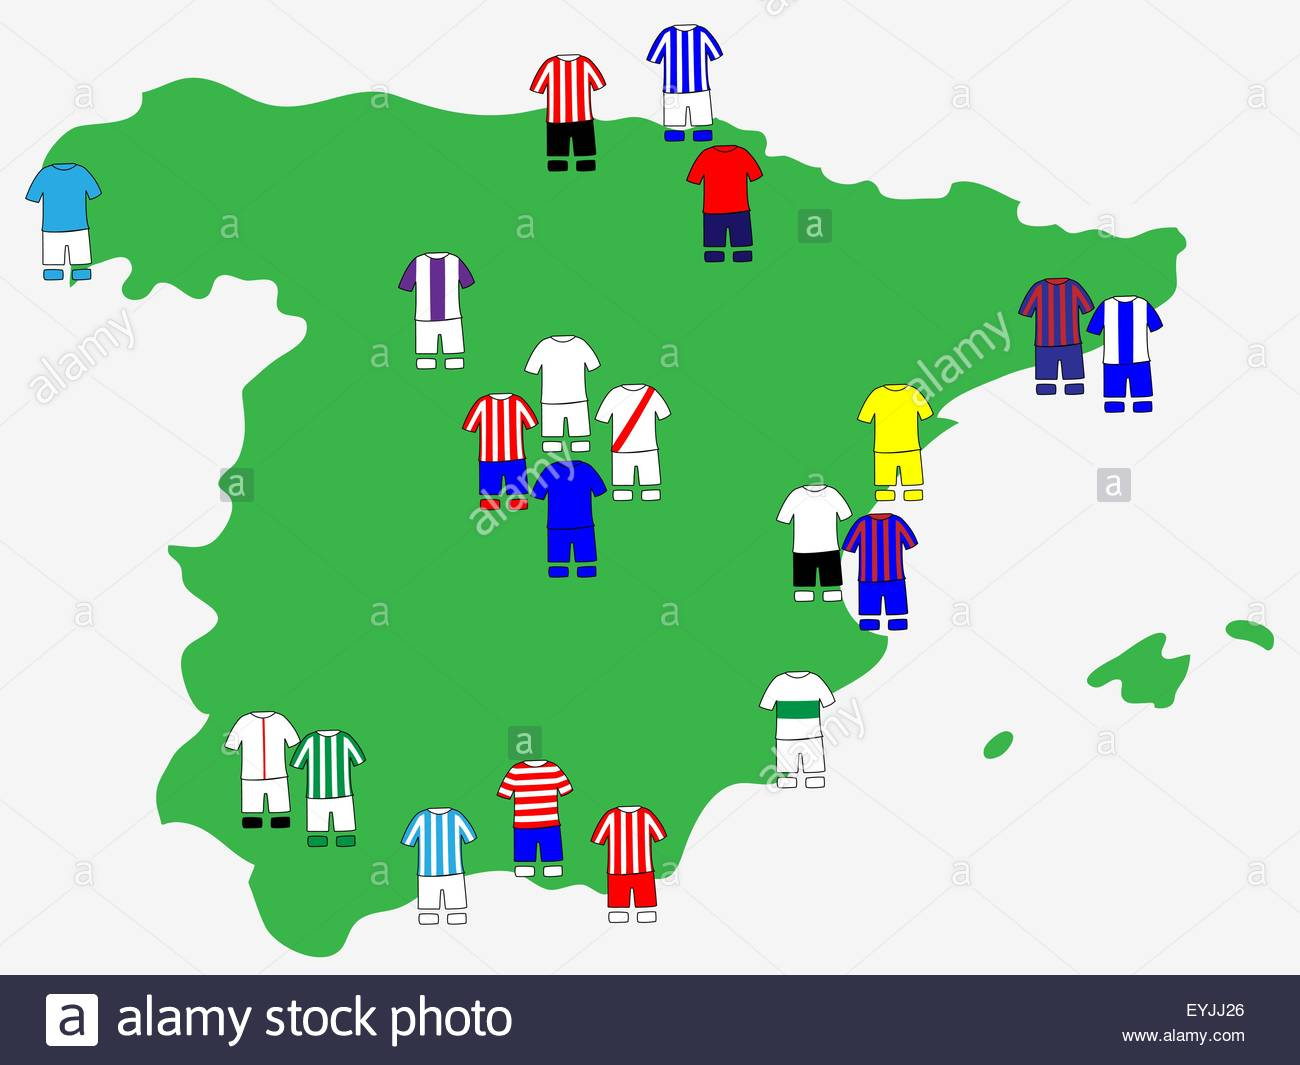 Spanish League Clubs Map 2013-14 La Liga Stock Vector Art